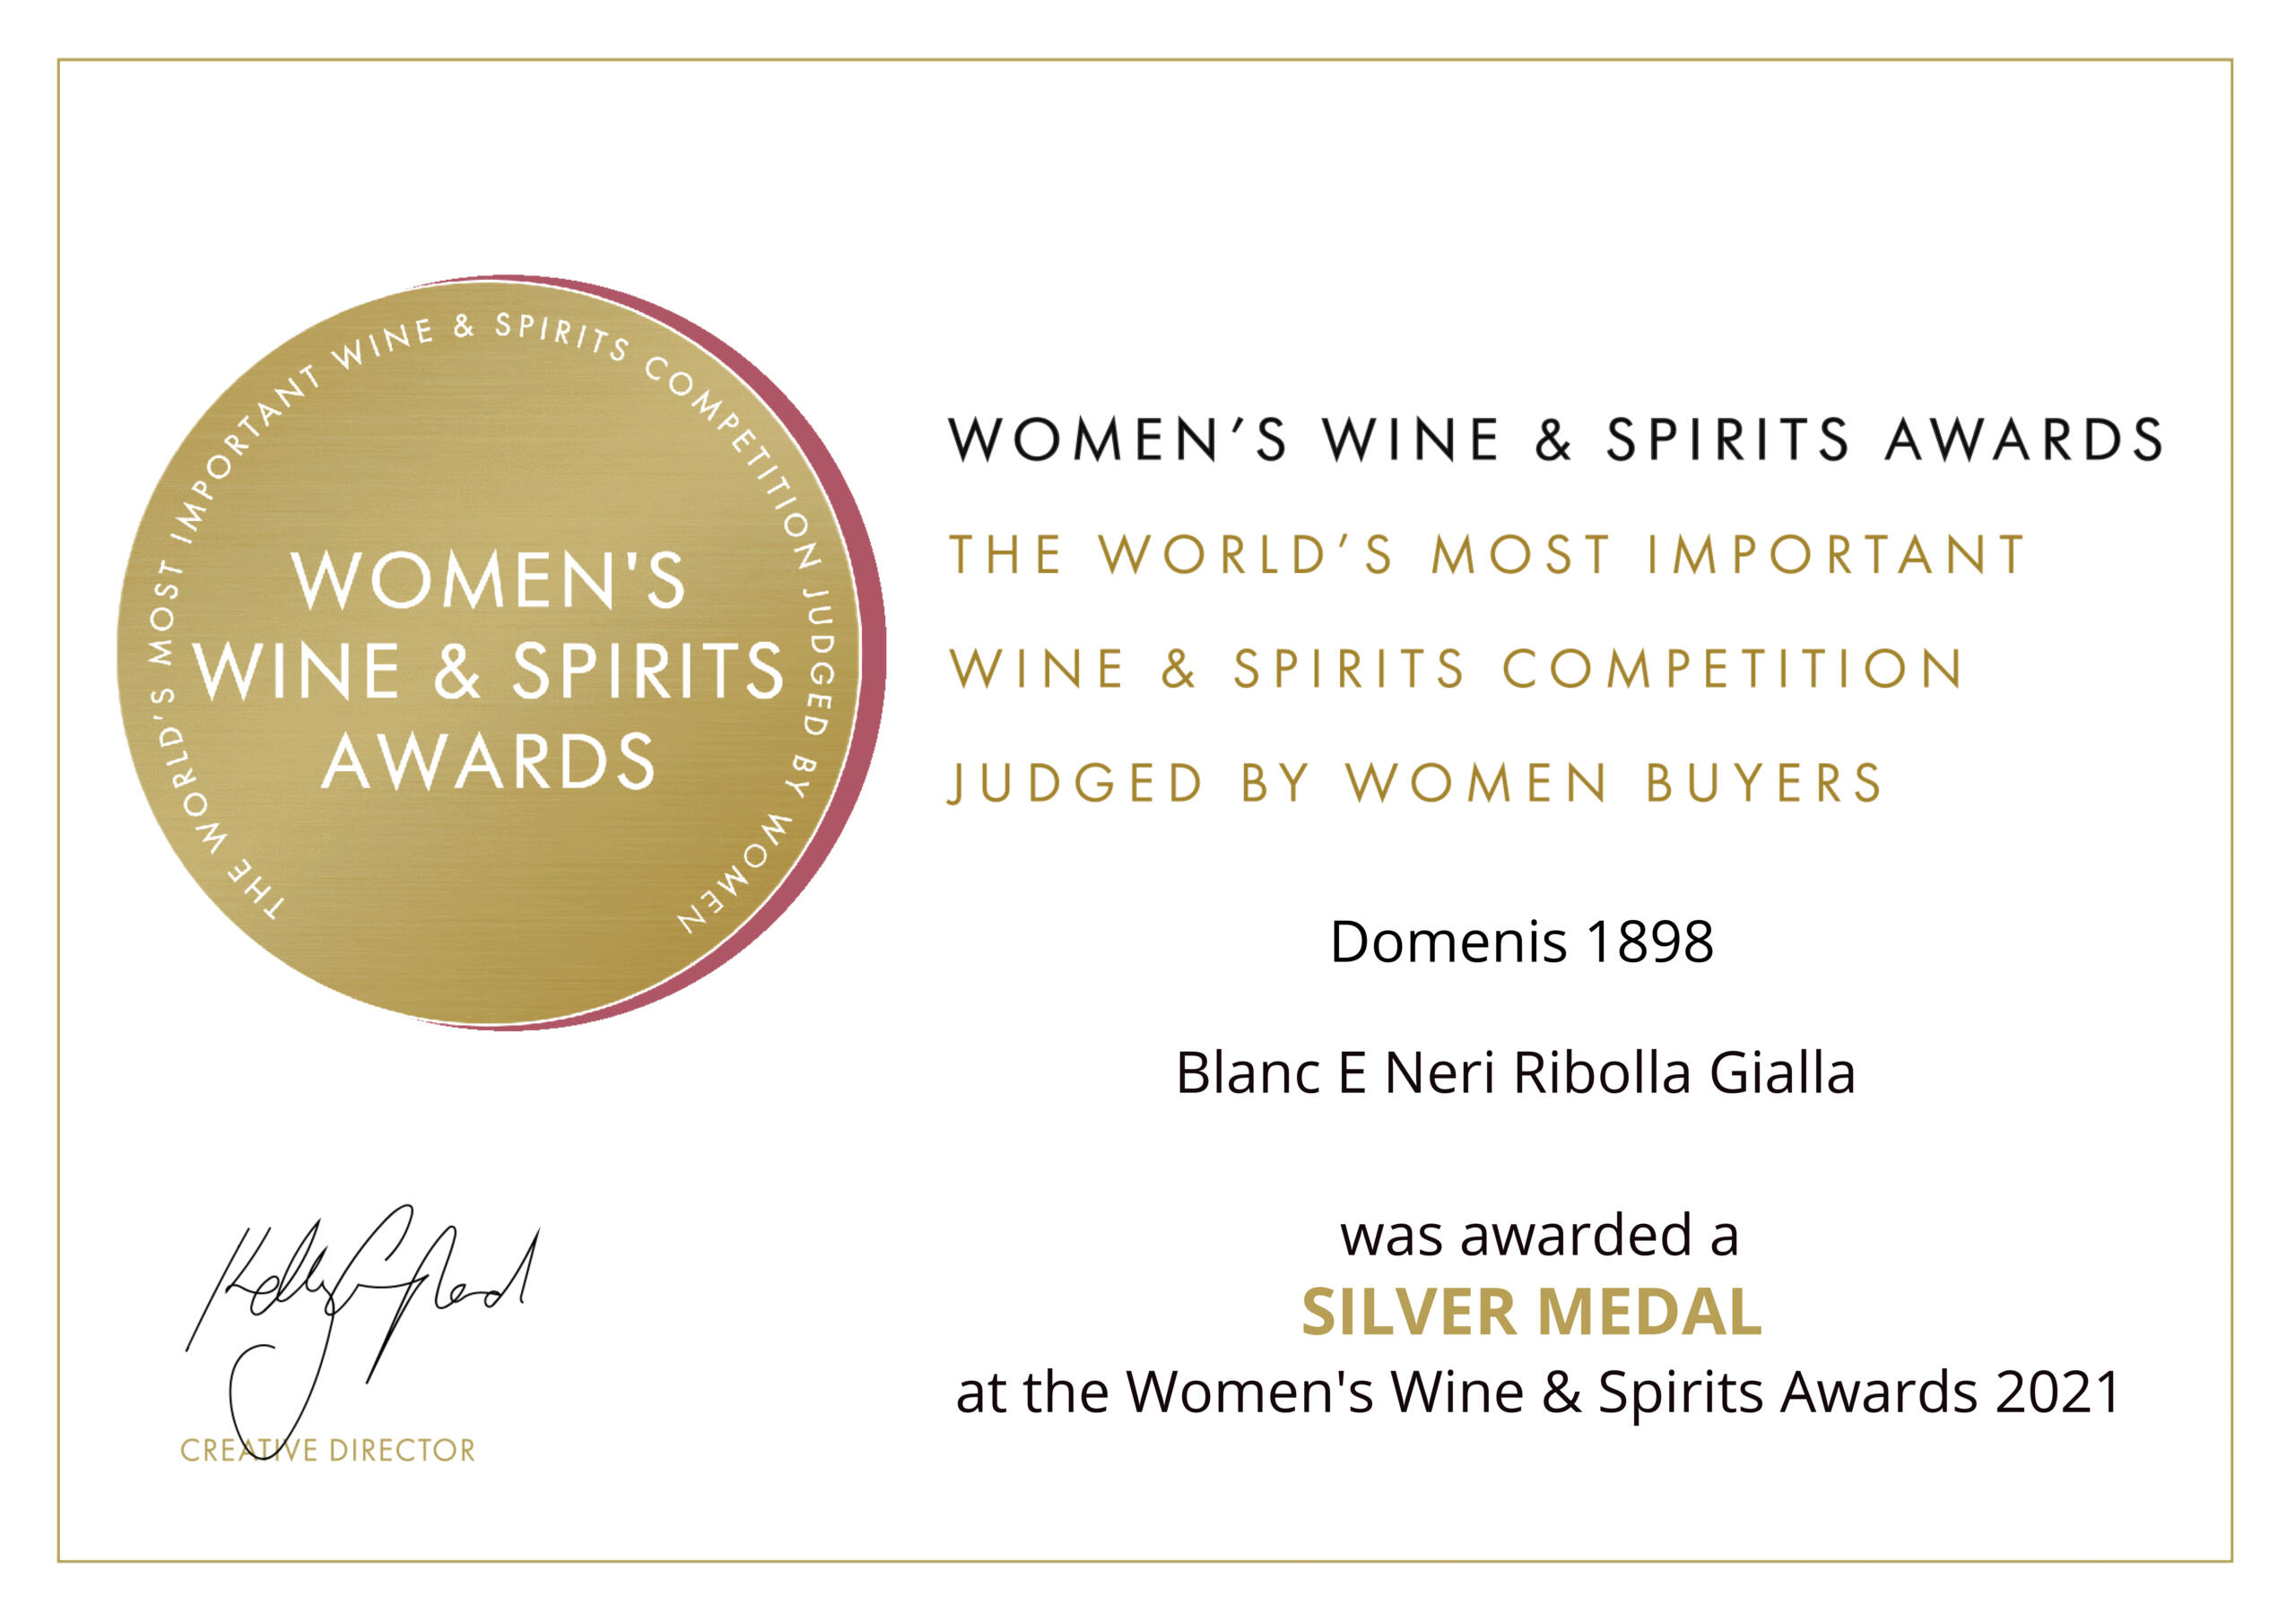 Women's Wine & Spirit Awards 2021 – Silver Medal – Blanc e Neri – Ribolla gialla